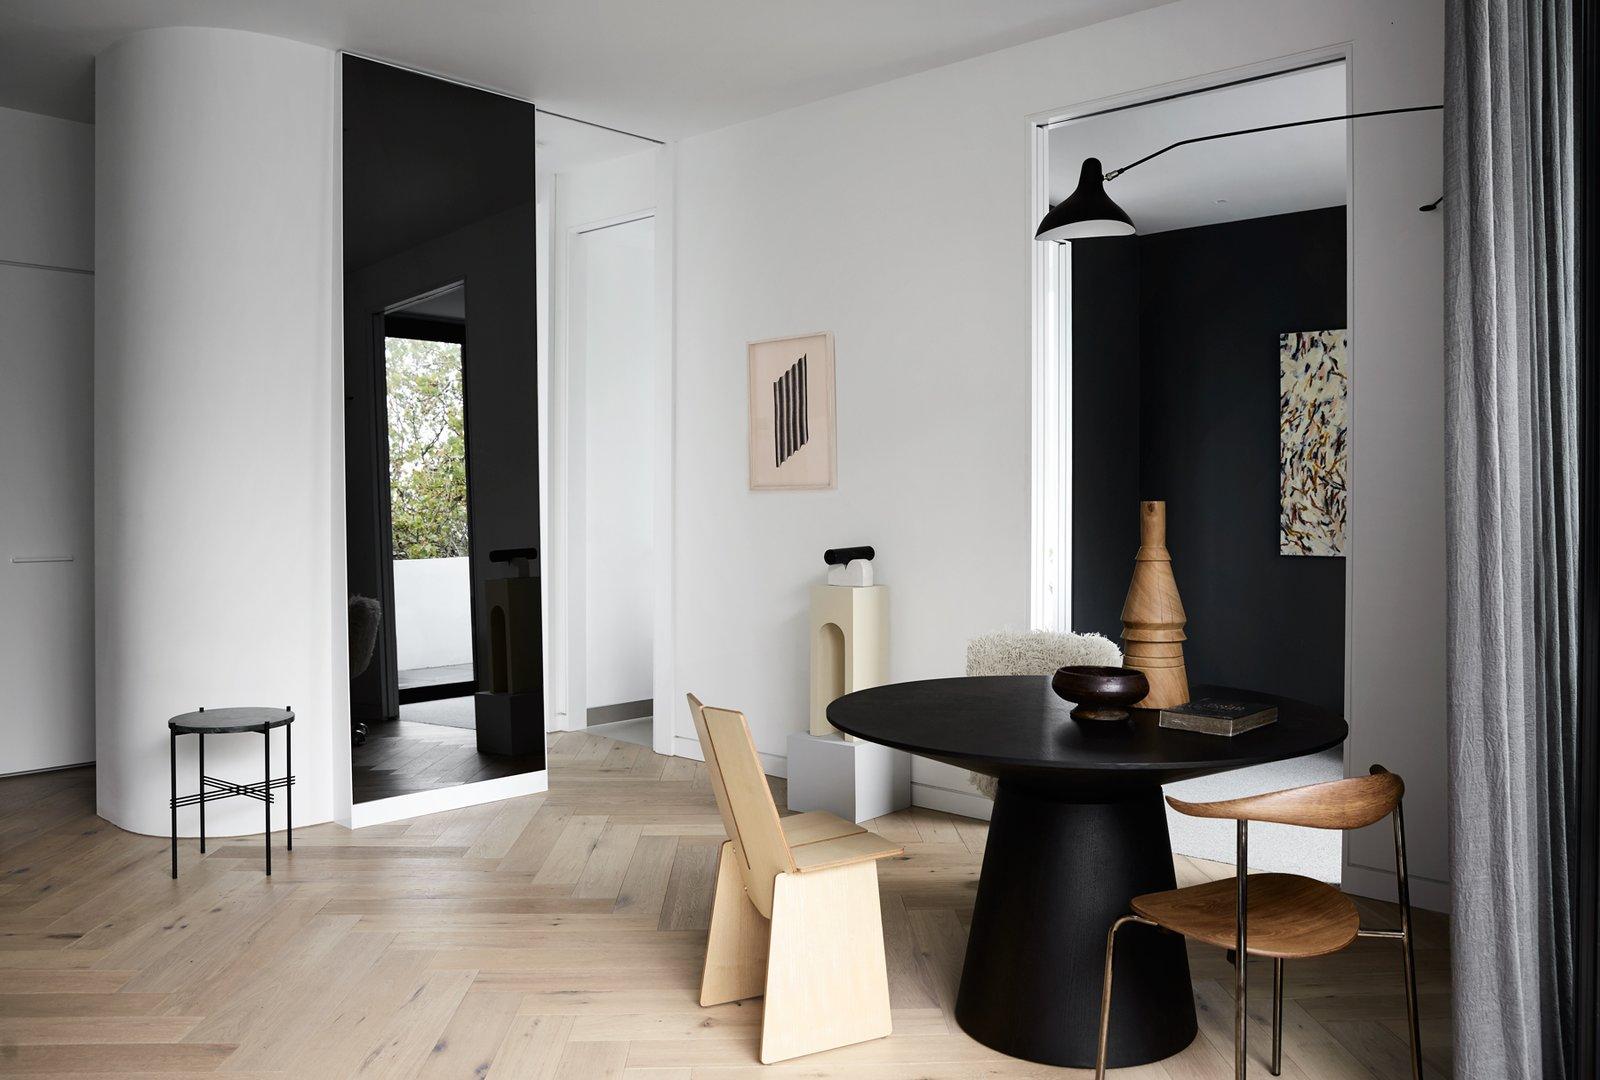 Living Room, Chair, Table, Wall Lighting, and Light Hardwood Floor  South Yarra Residence